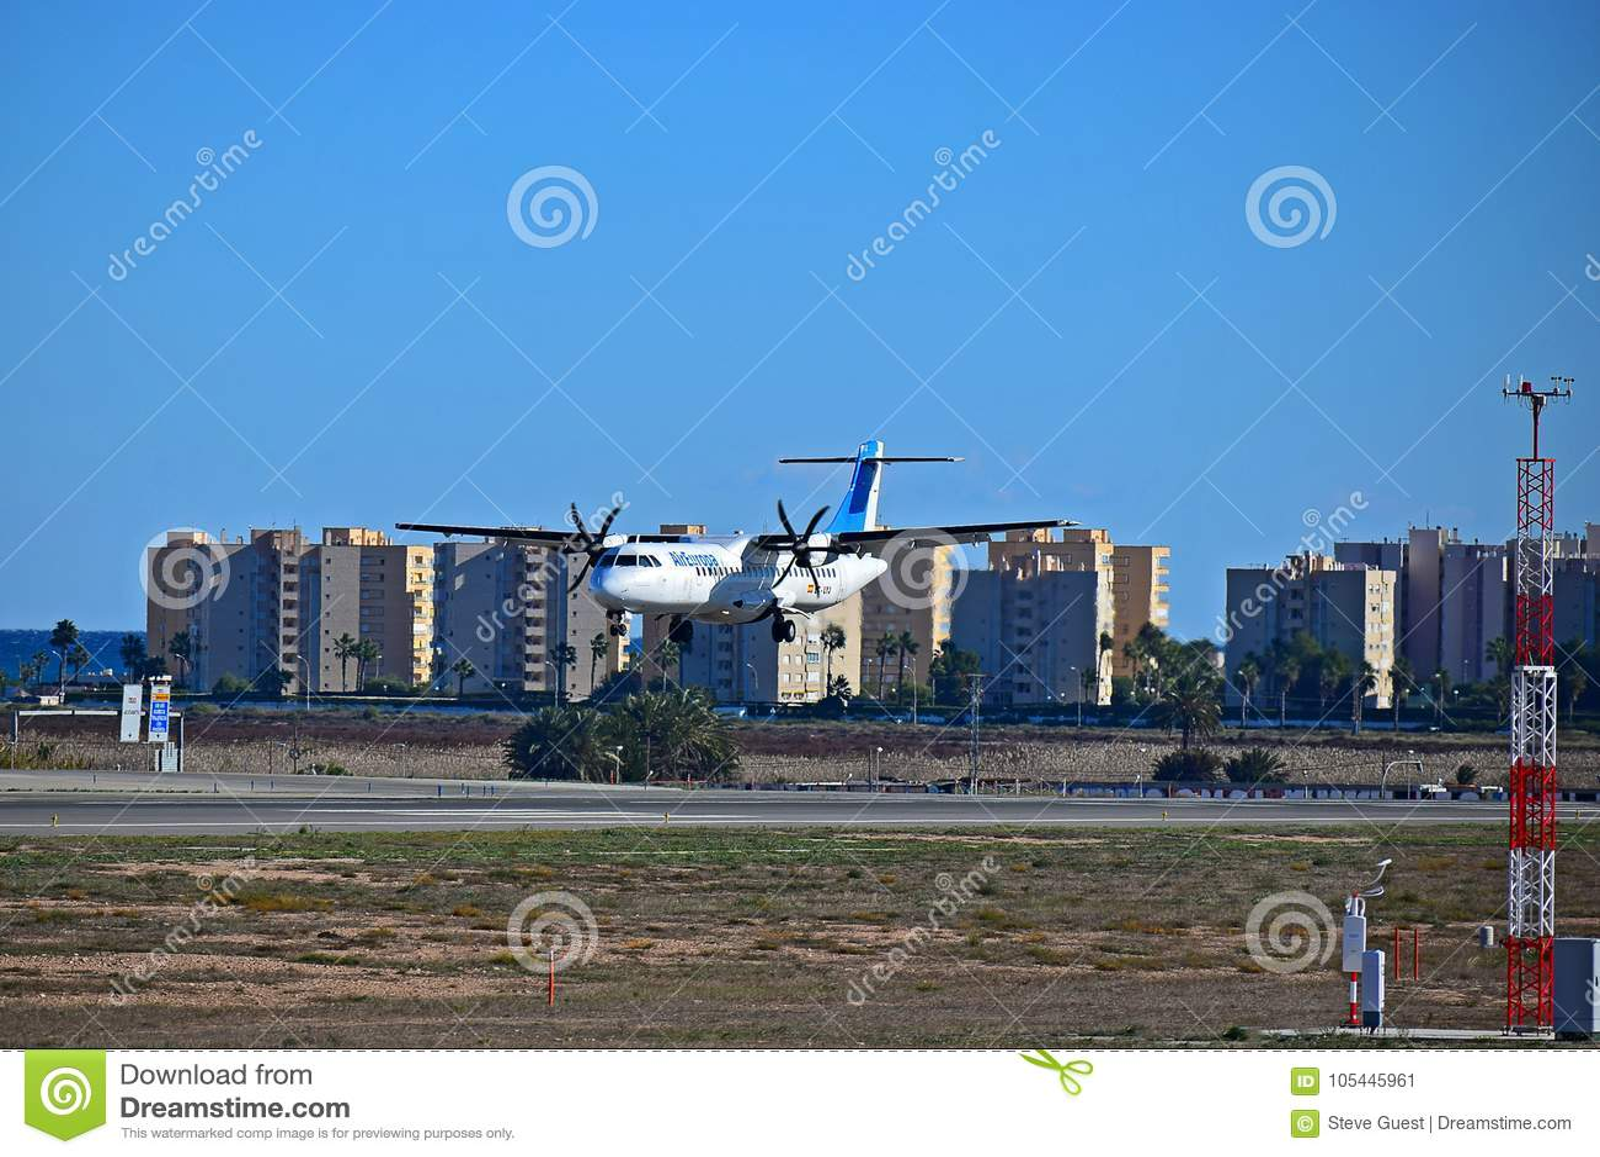 Air Europa Passenger Plane Landing At Alicante Airport